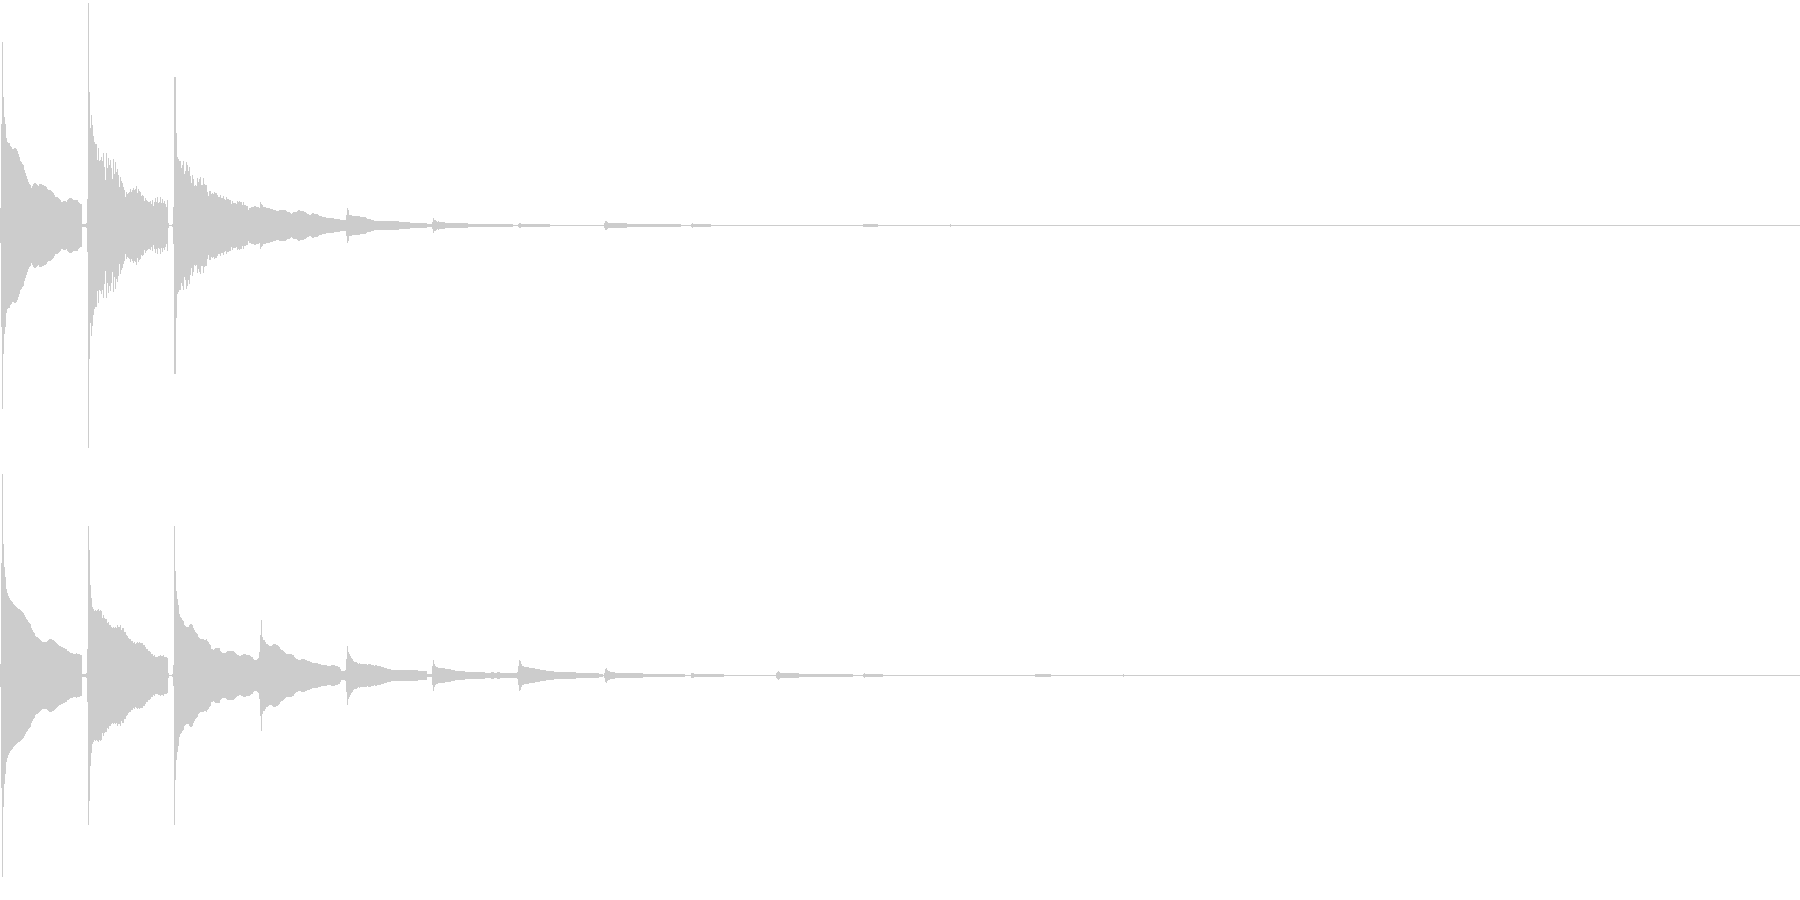 Cash 電子マネー 決済認証・通知SEの未再生の波形